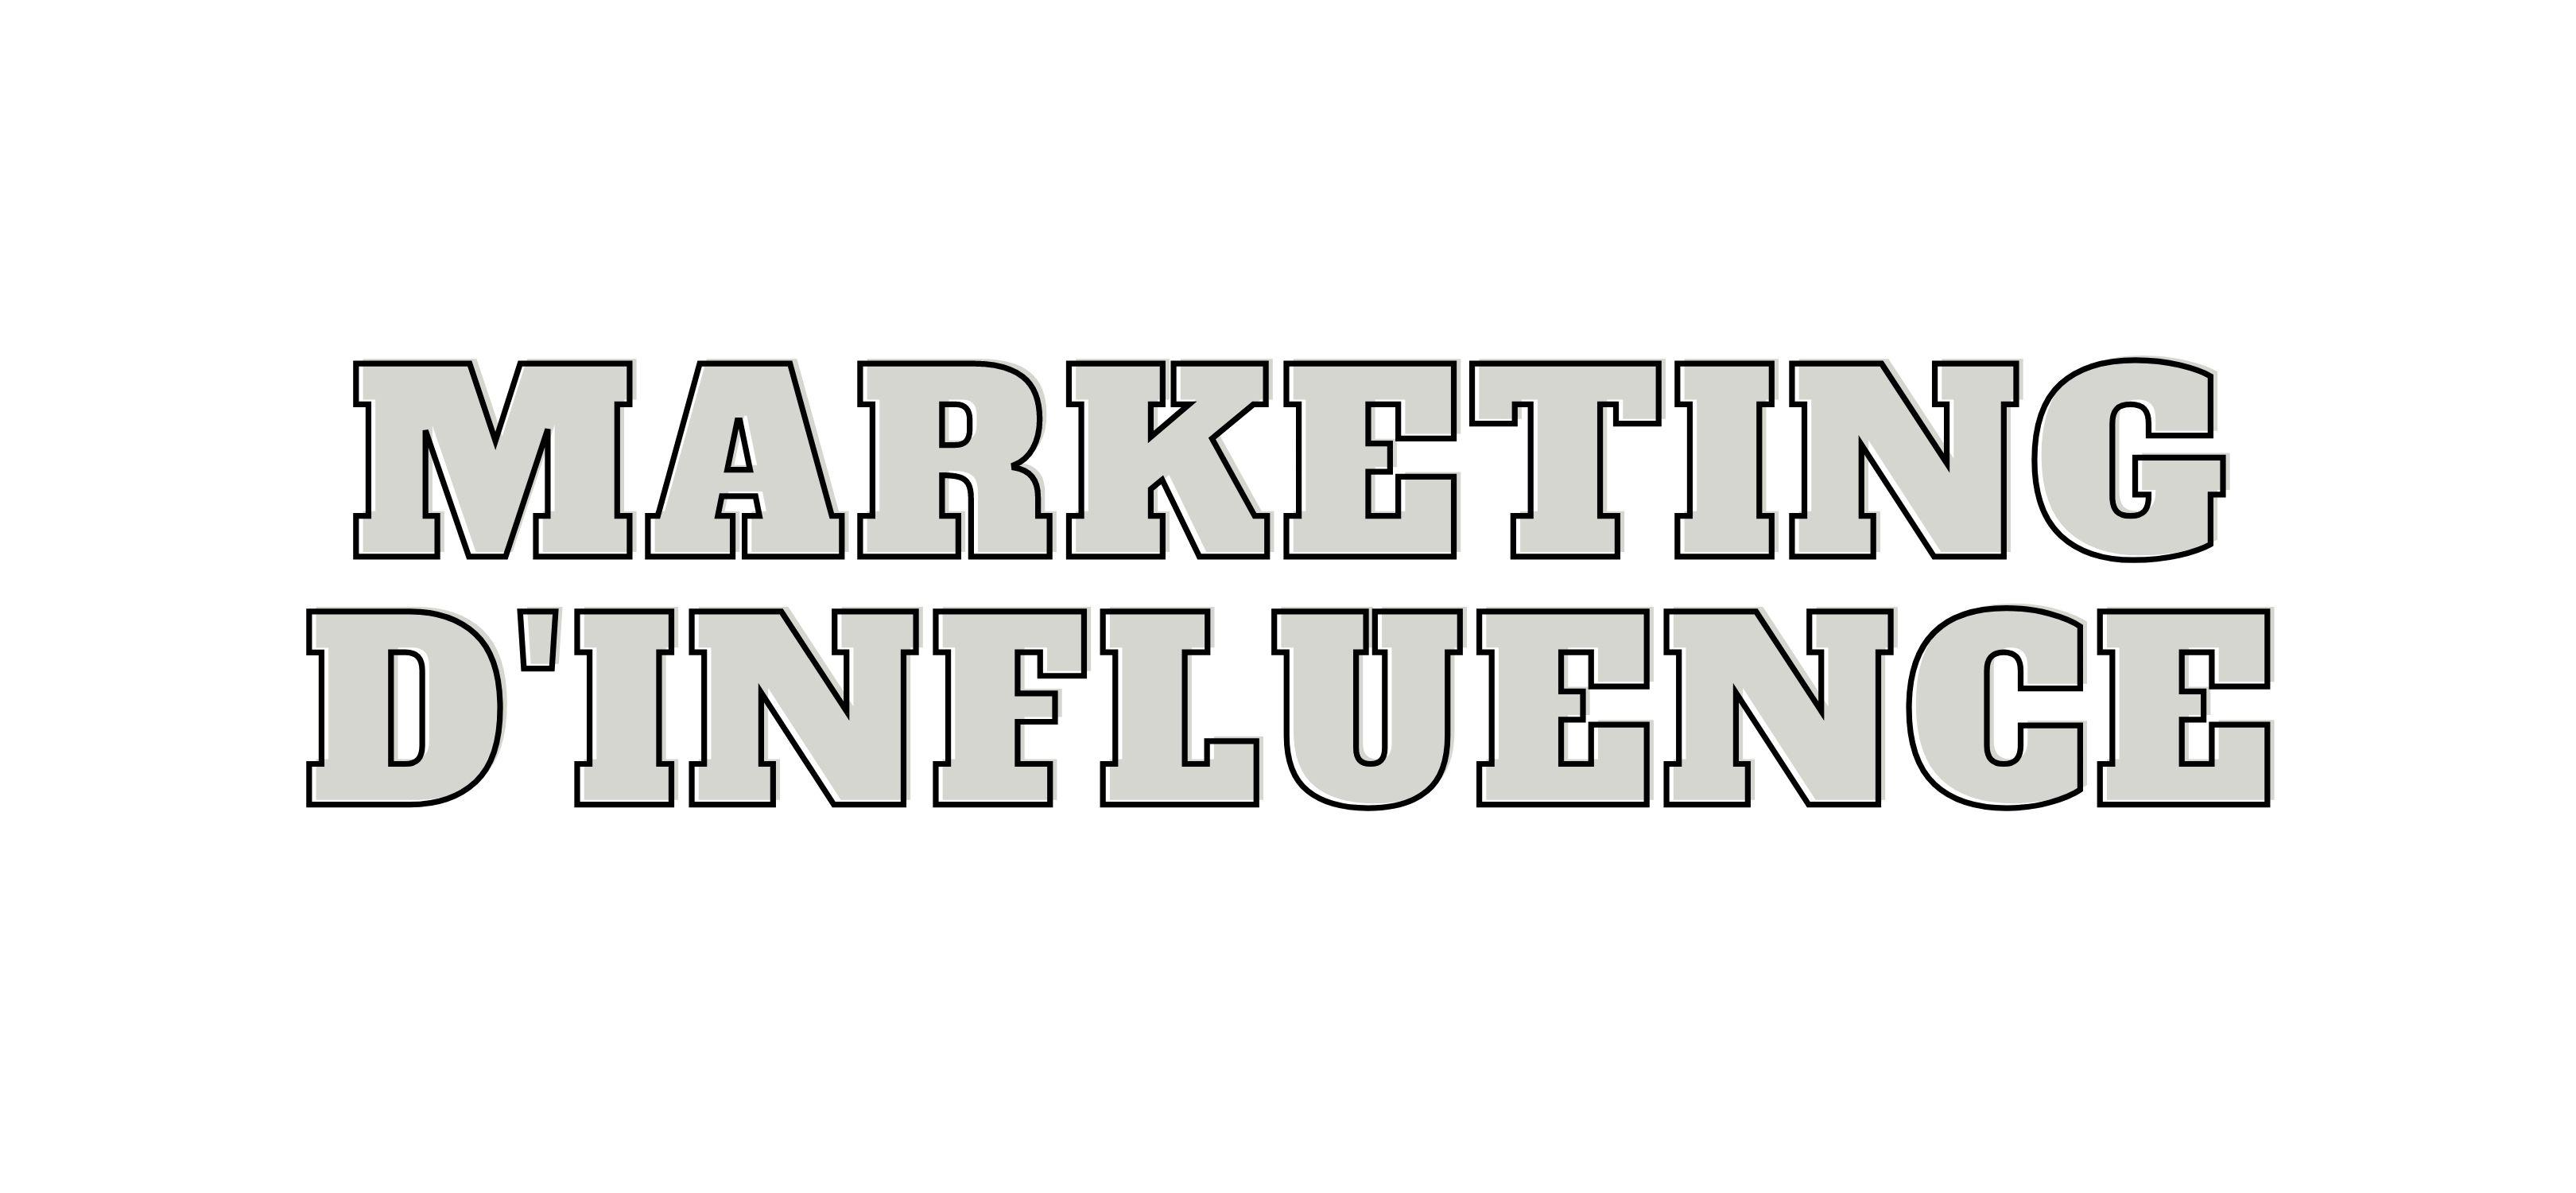 marketinf-dinluence-logo